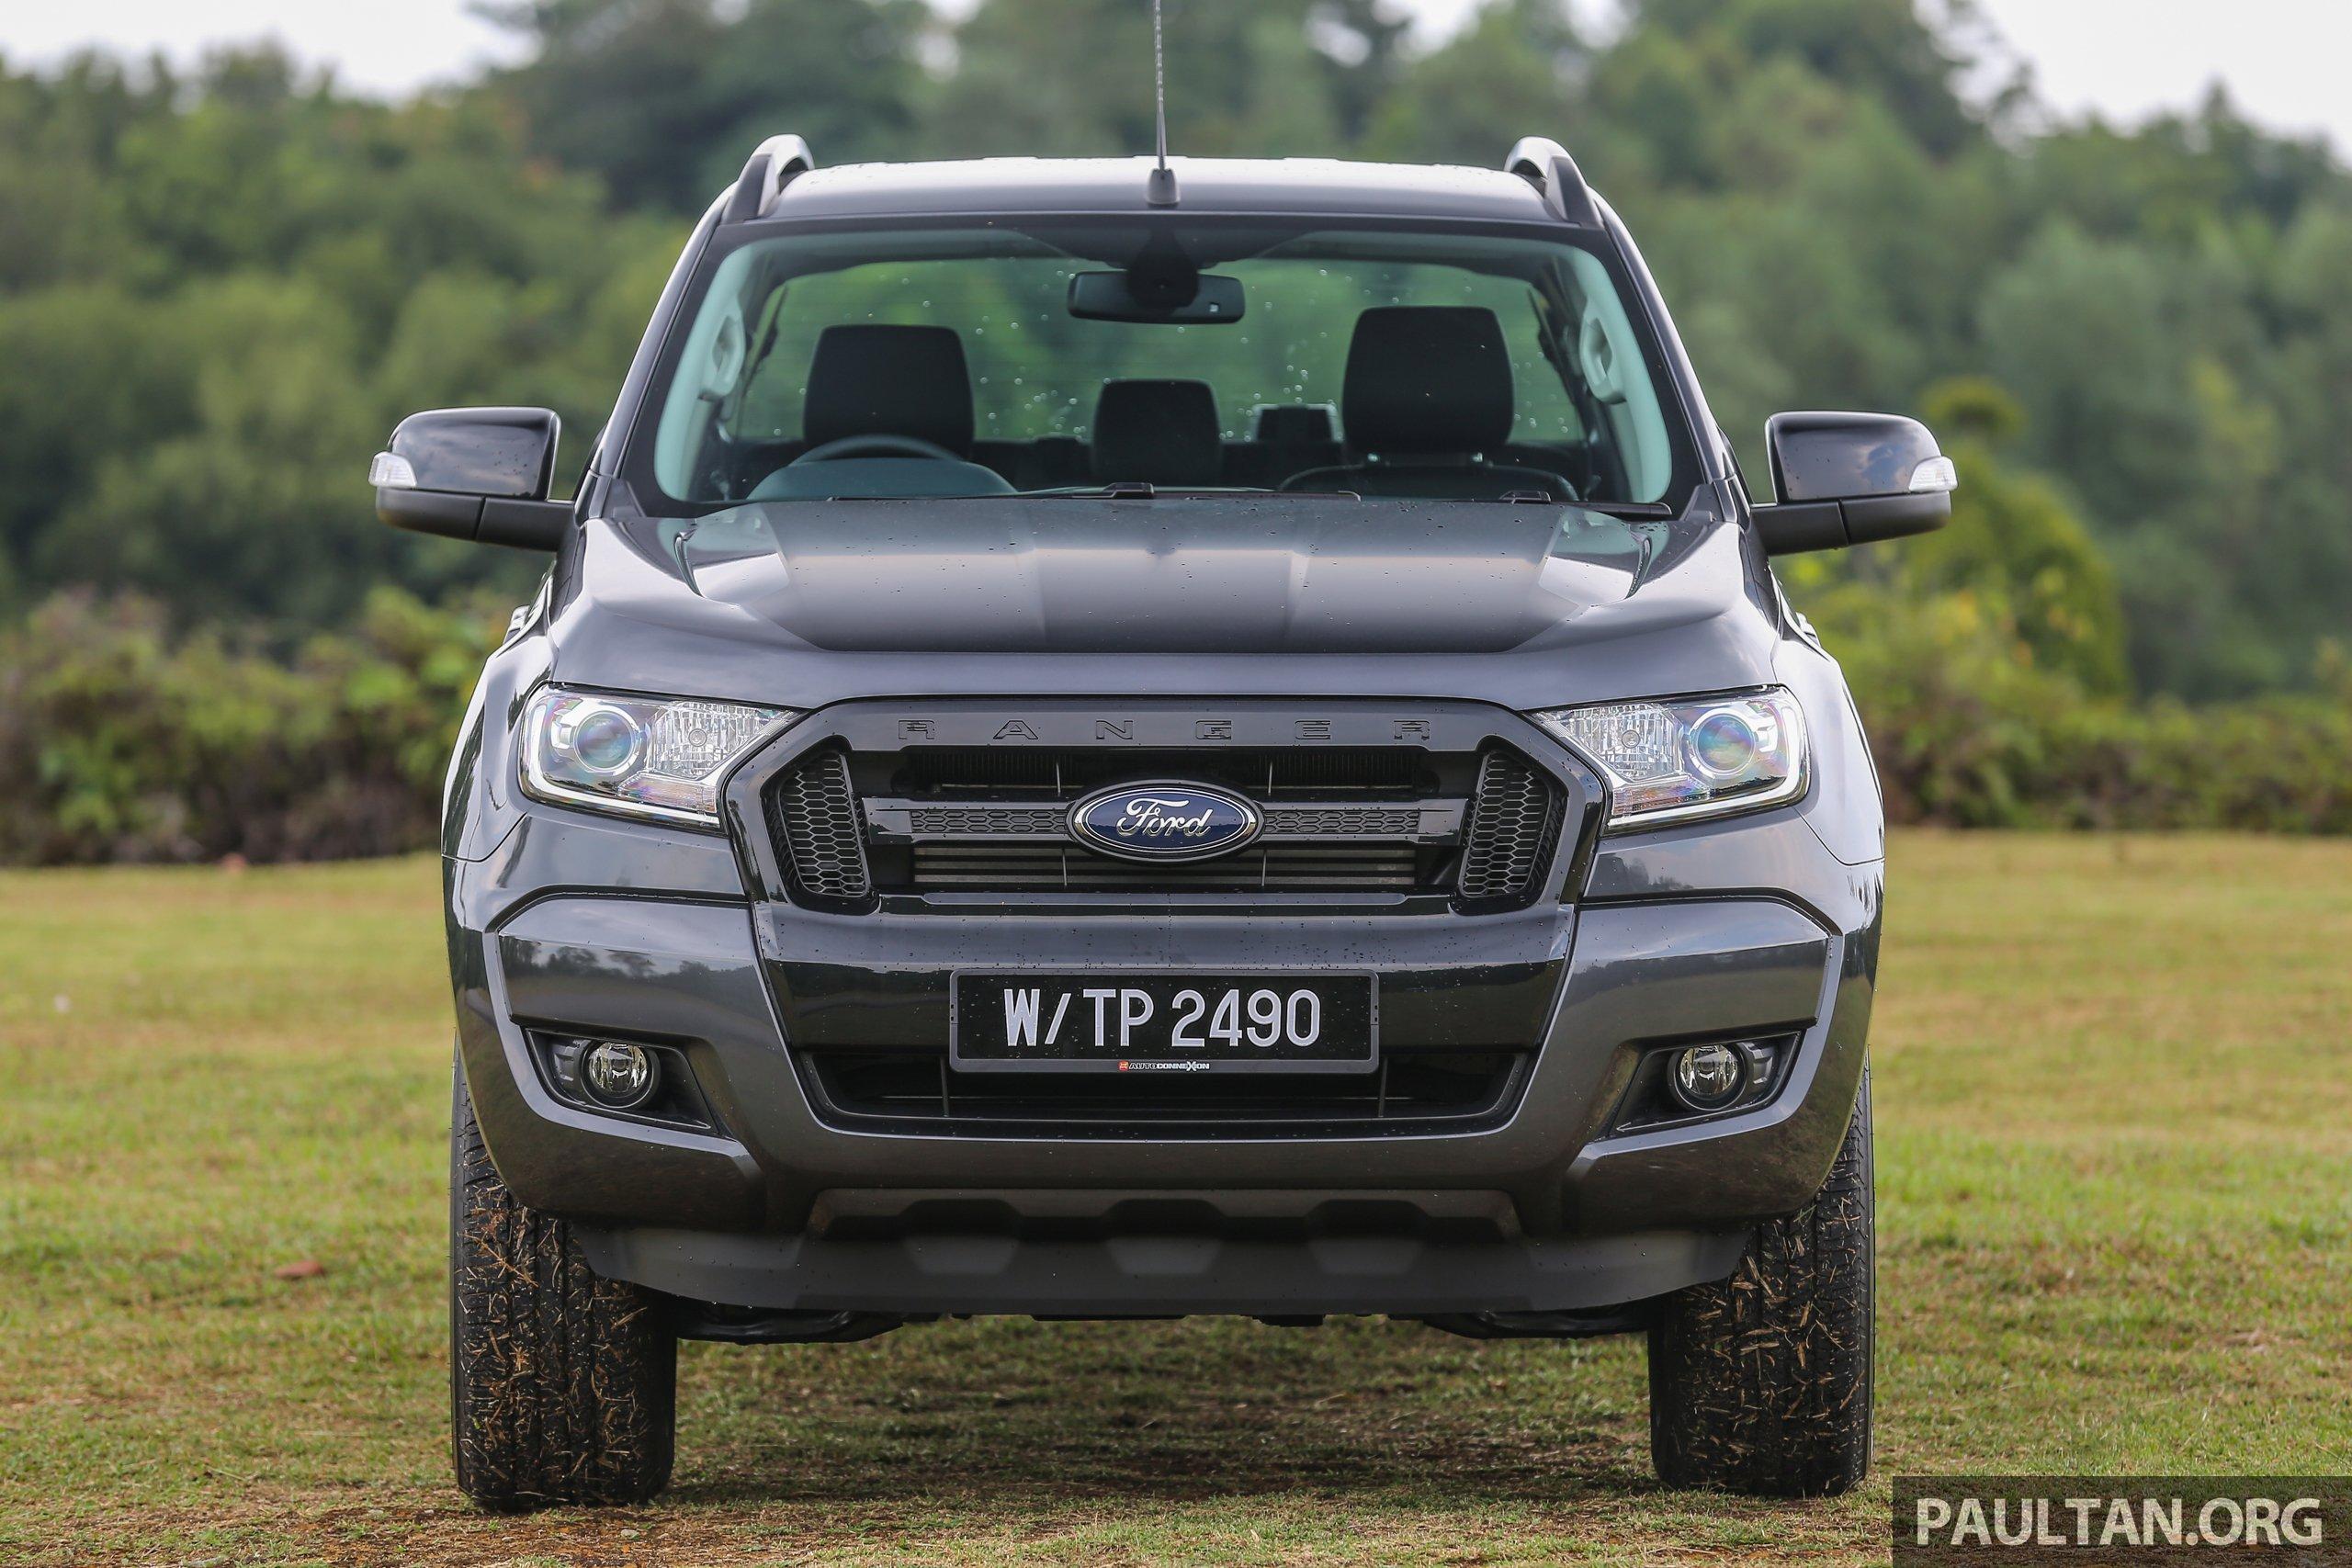 2016 Ford Ranger >> Ford Ranger 2.2L FX4 coming April 20 – RM122k est Image 642120